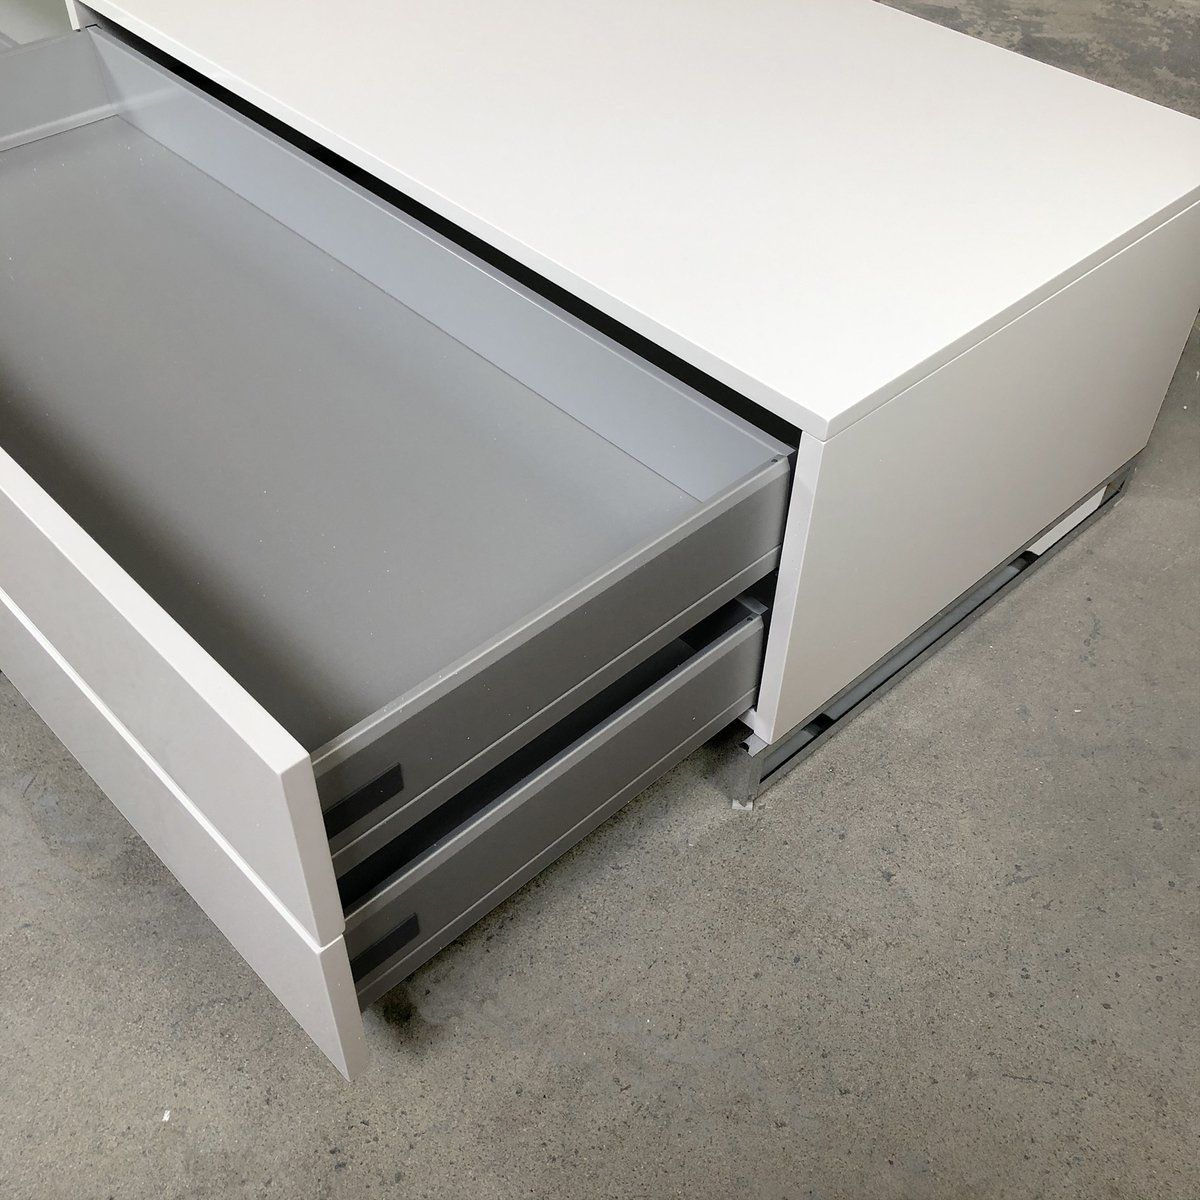 Athos Console Upscale Furniture Consignment Furniture White